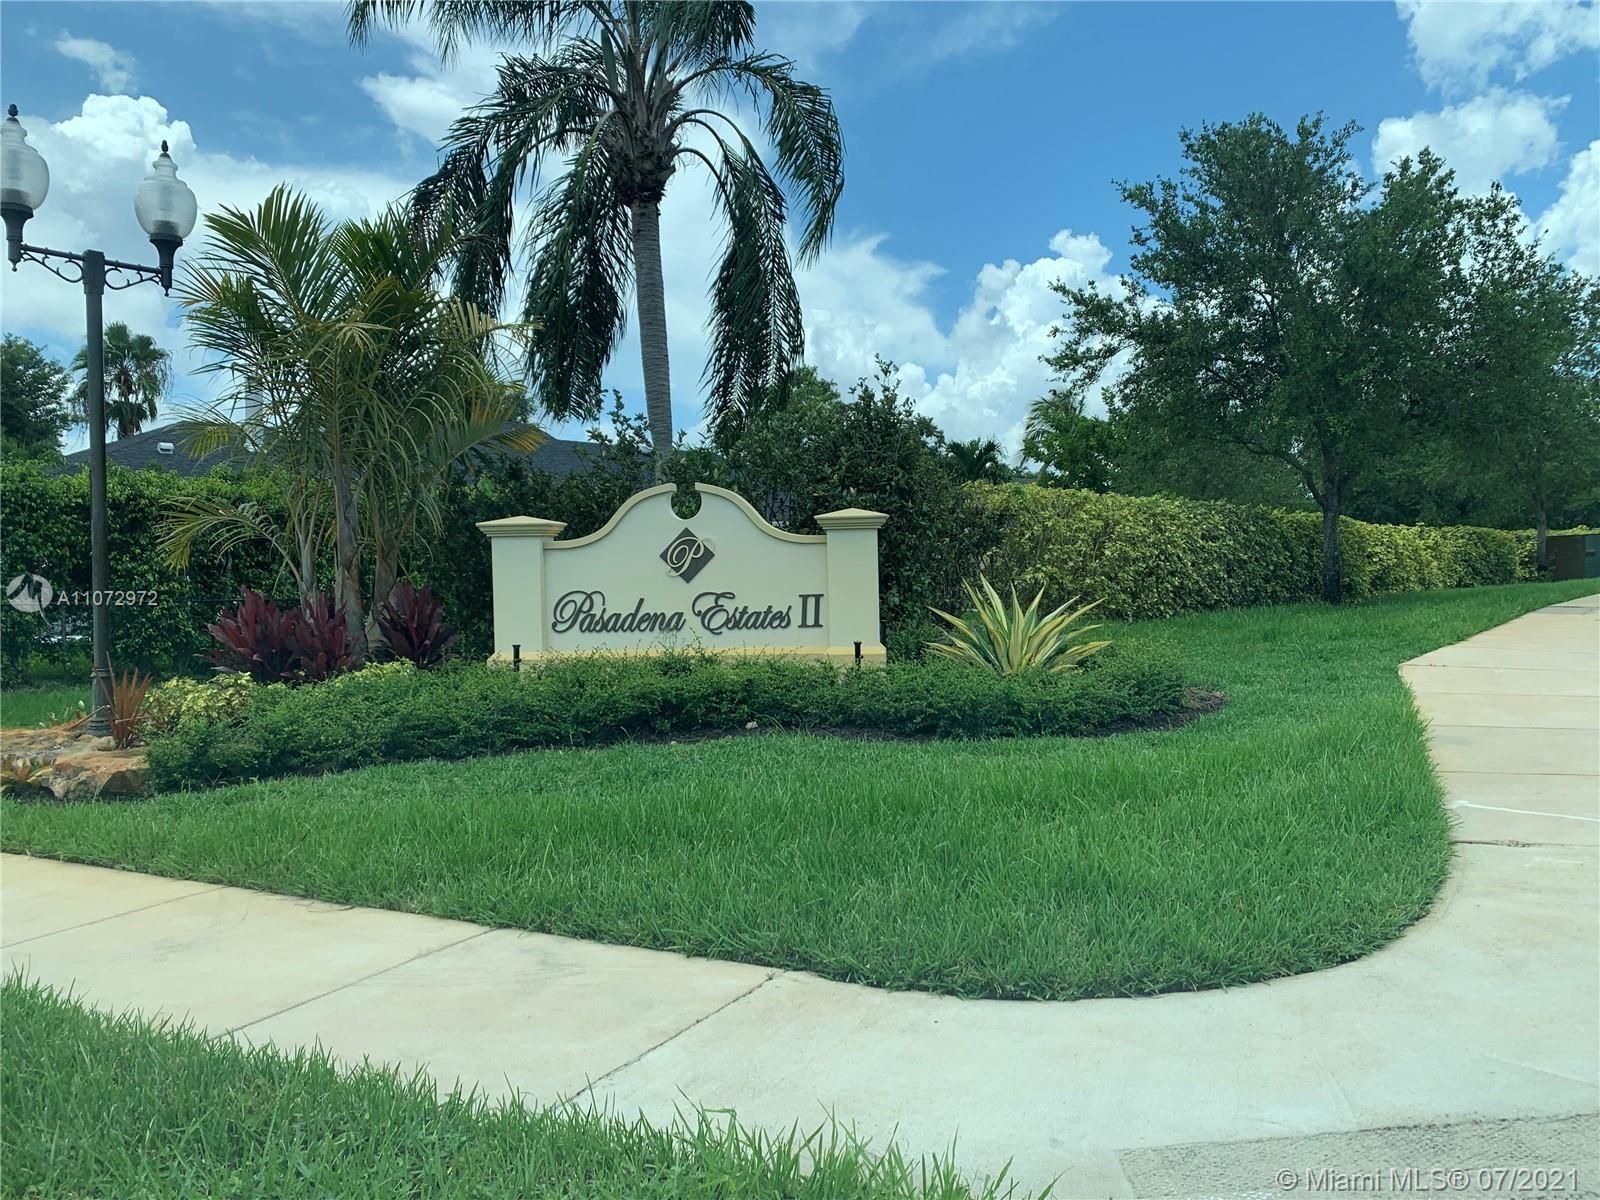 211 NW 197th Ave, Pembroke Pines, FL 33029 - #: A11072972